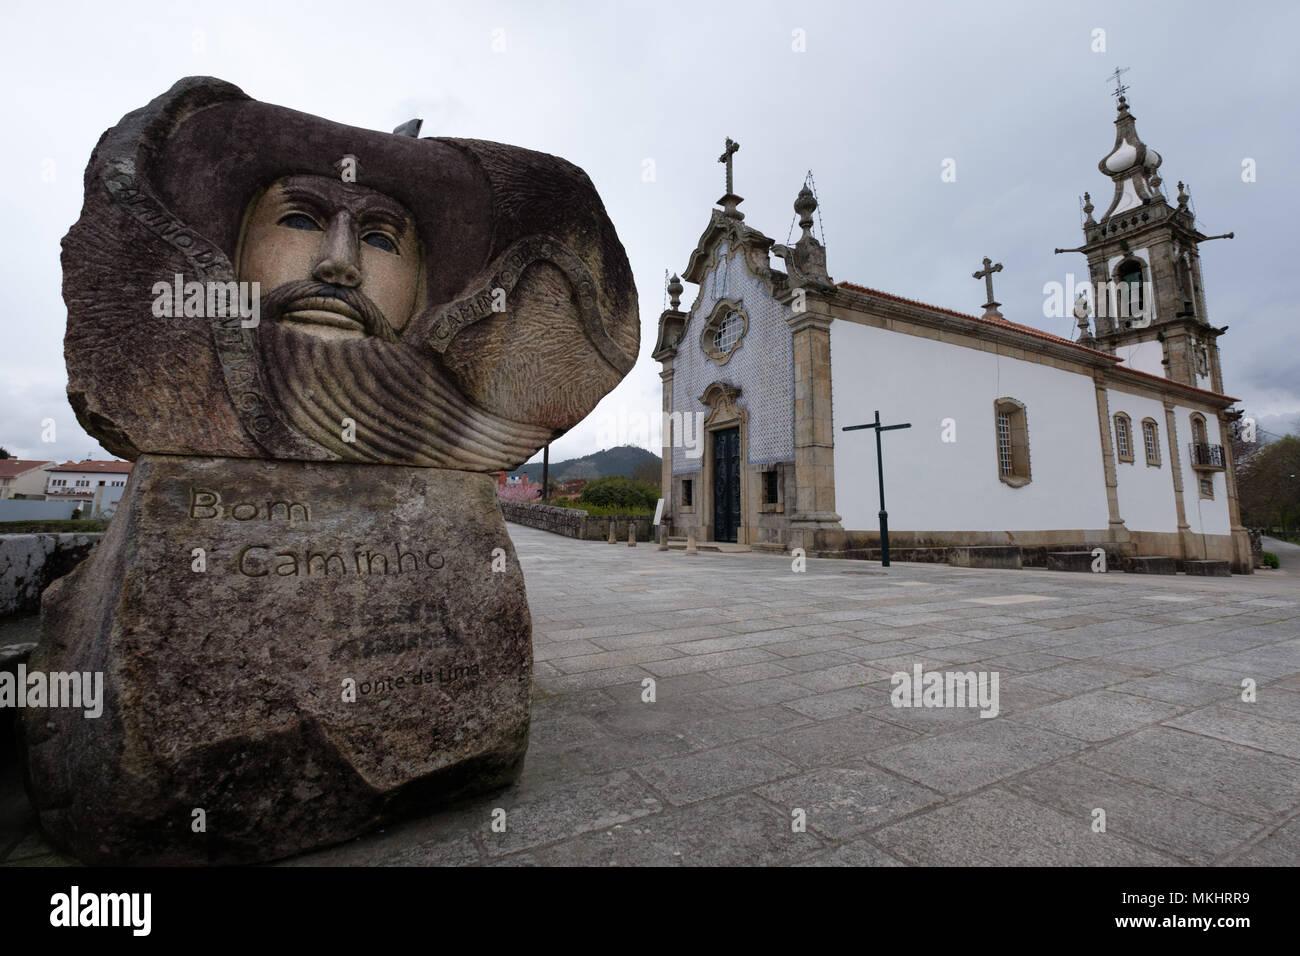 Sculpture honoring the pilgrims of the St. James way next to the Igreja de Santo António da Torre Velha catholic church in Ponte de Lima, Portugal Stock Photo